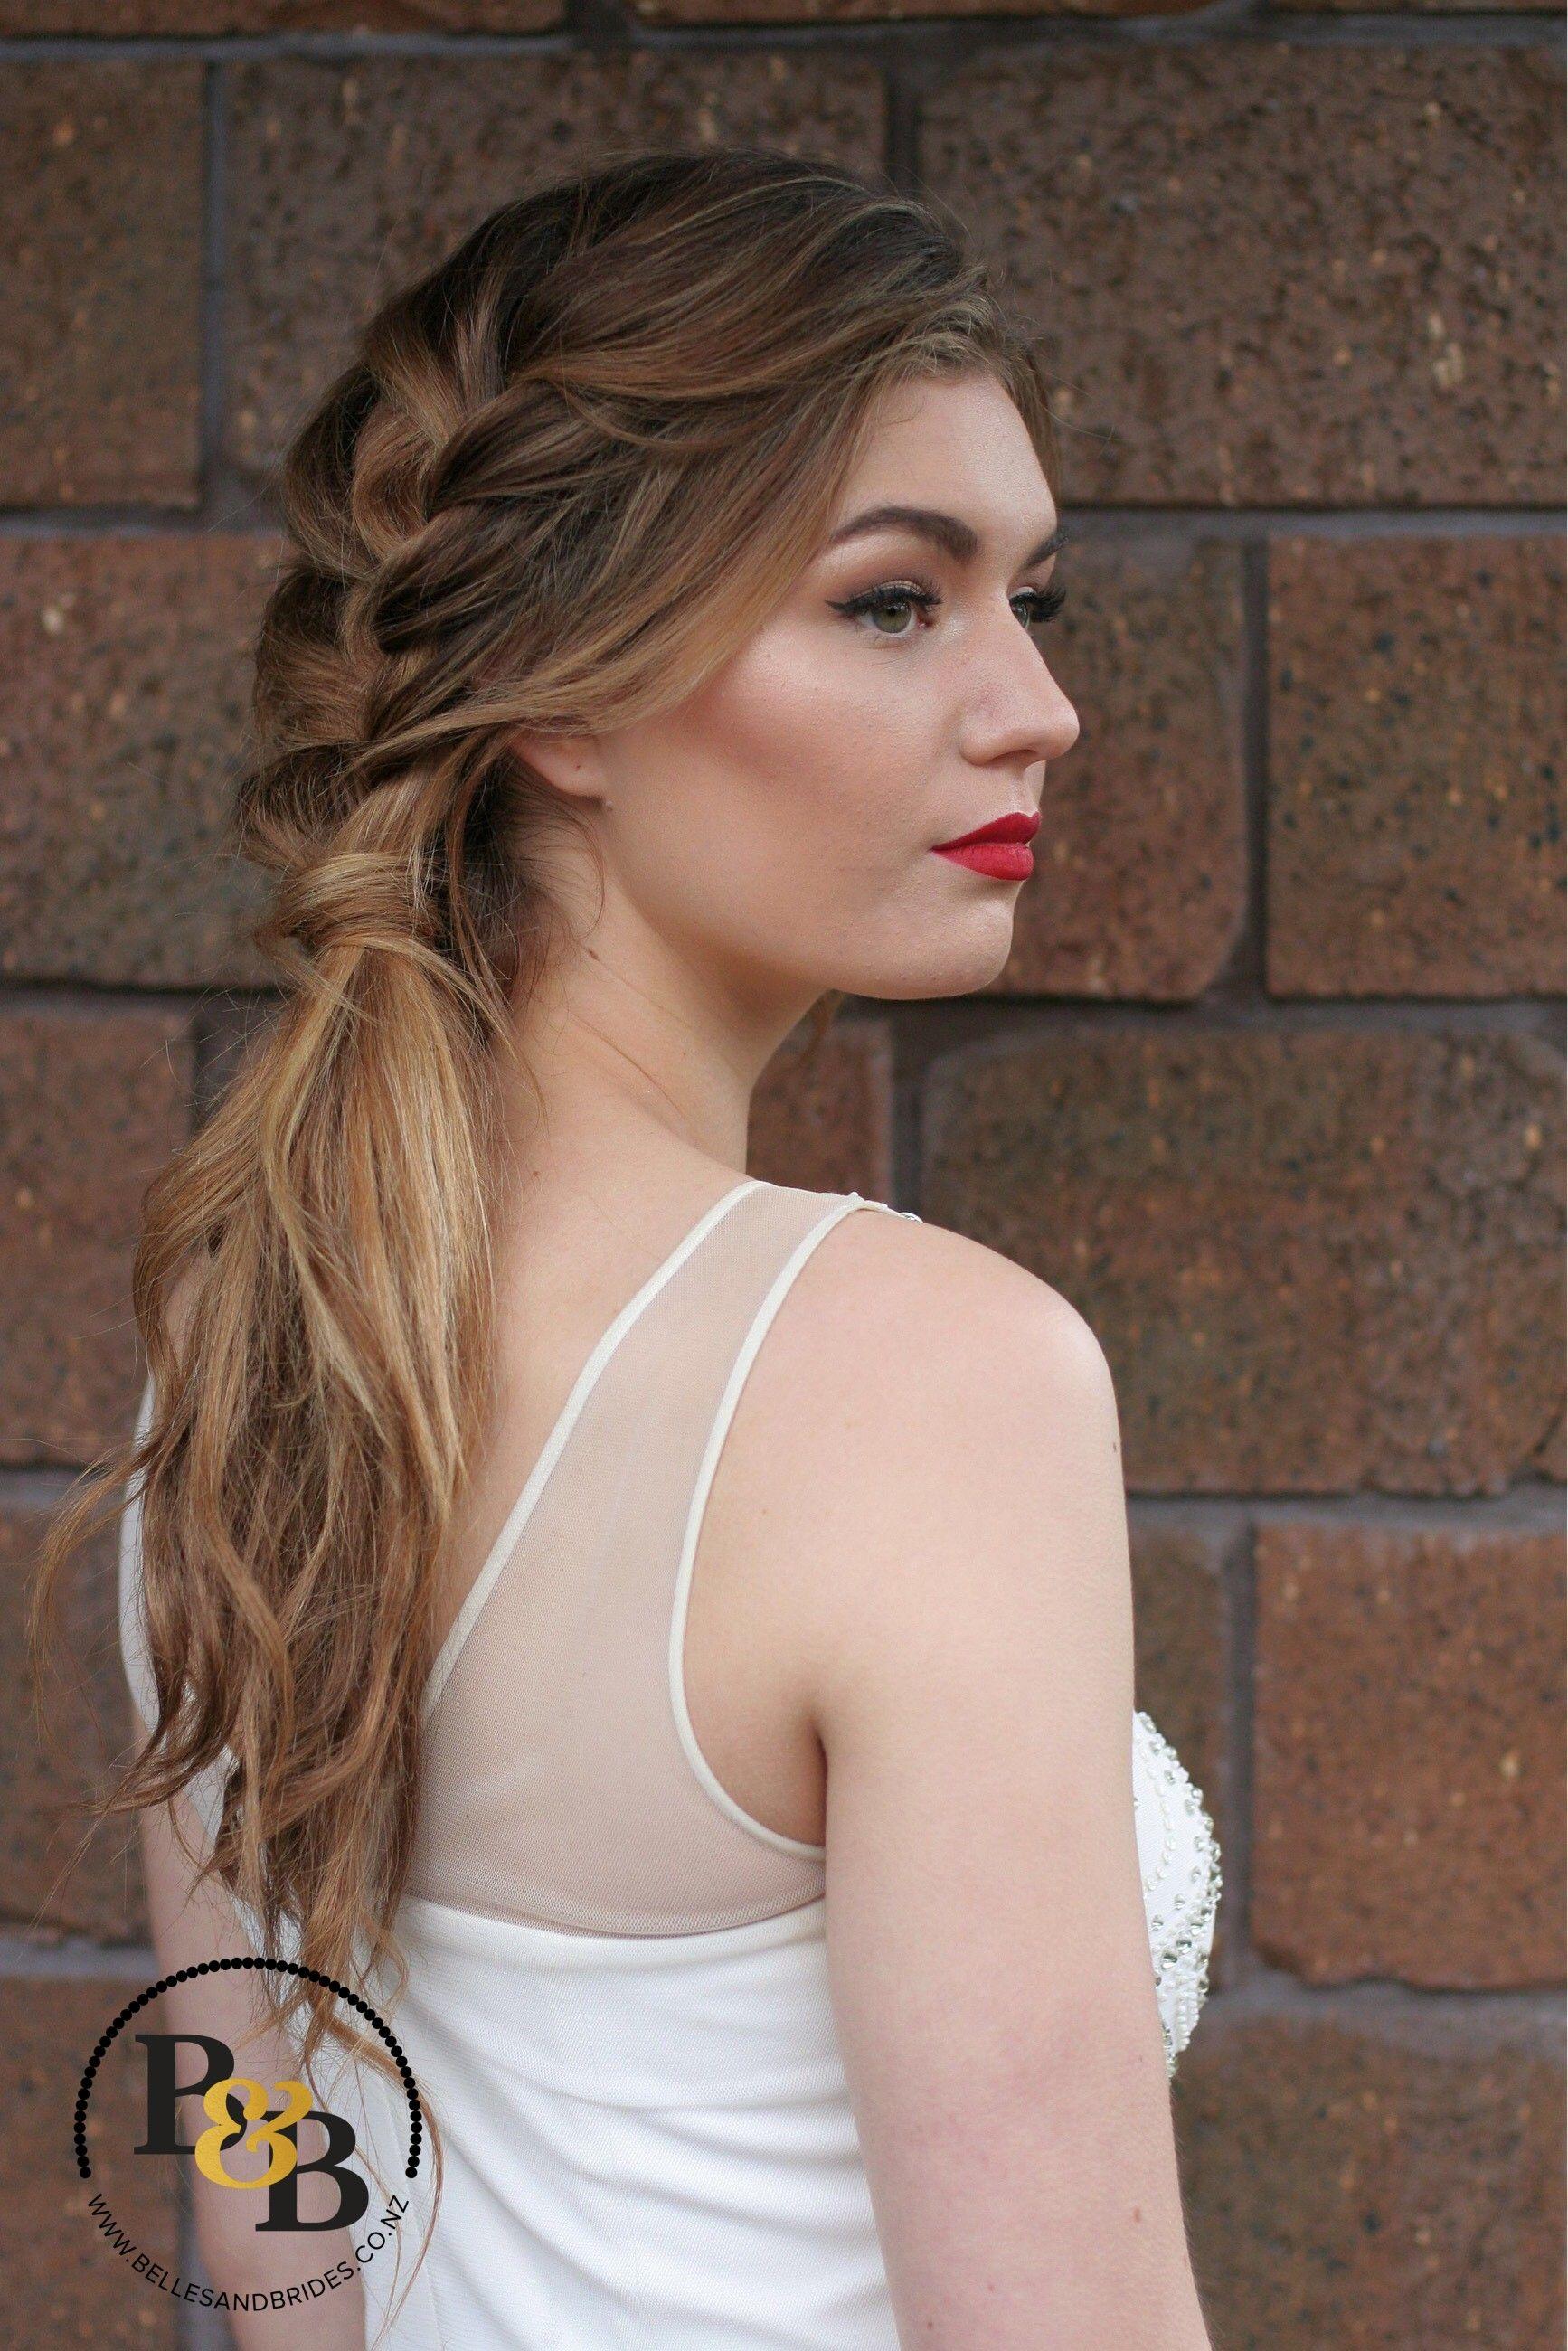 bridal makeup with red lip / winged liner bridal makeup / contour